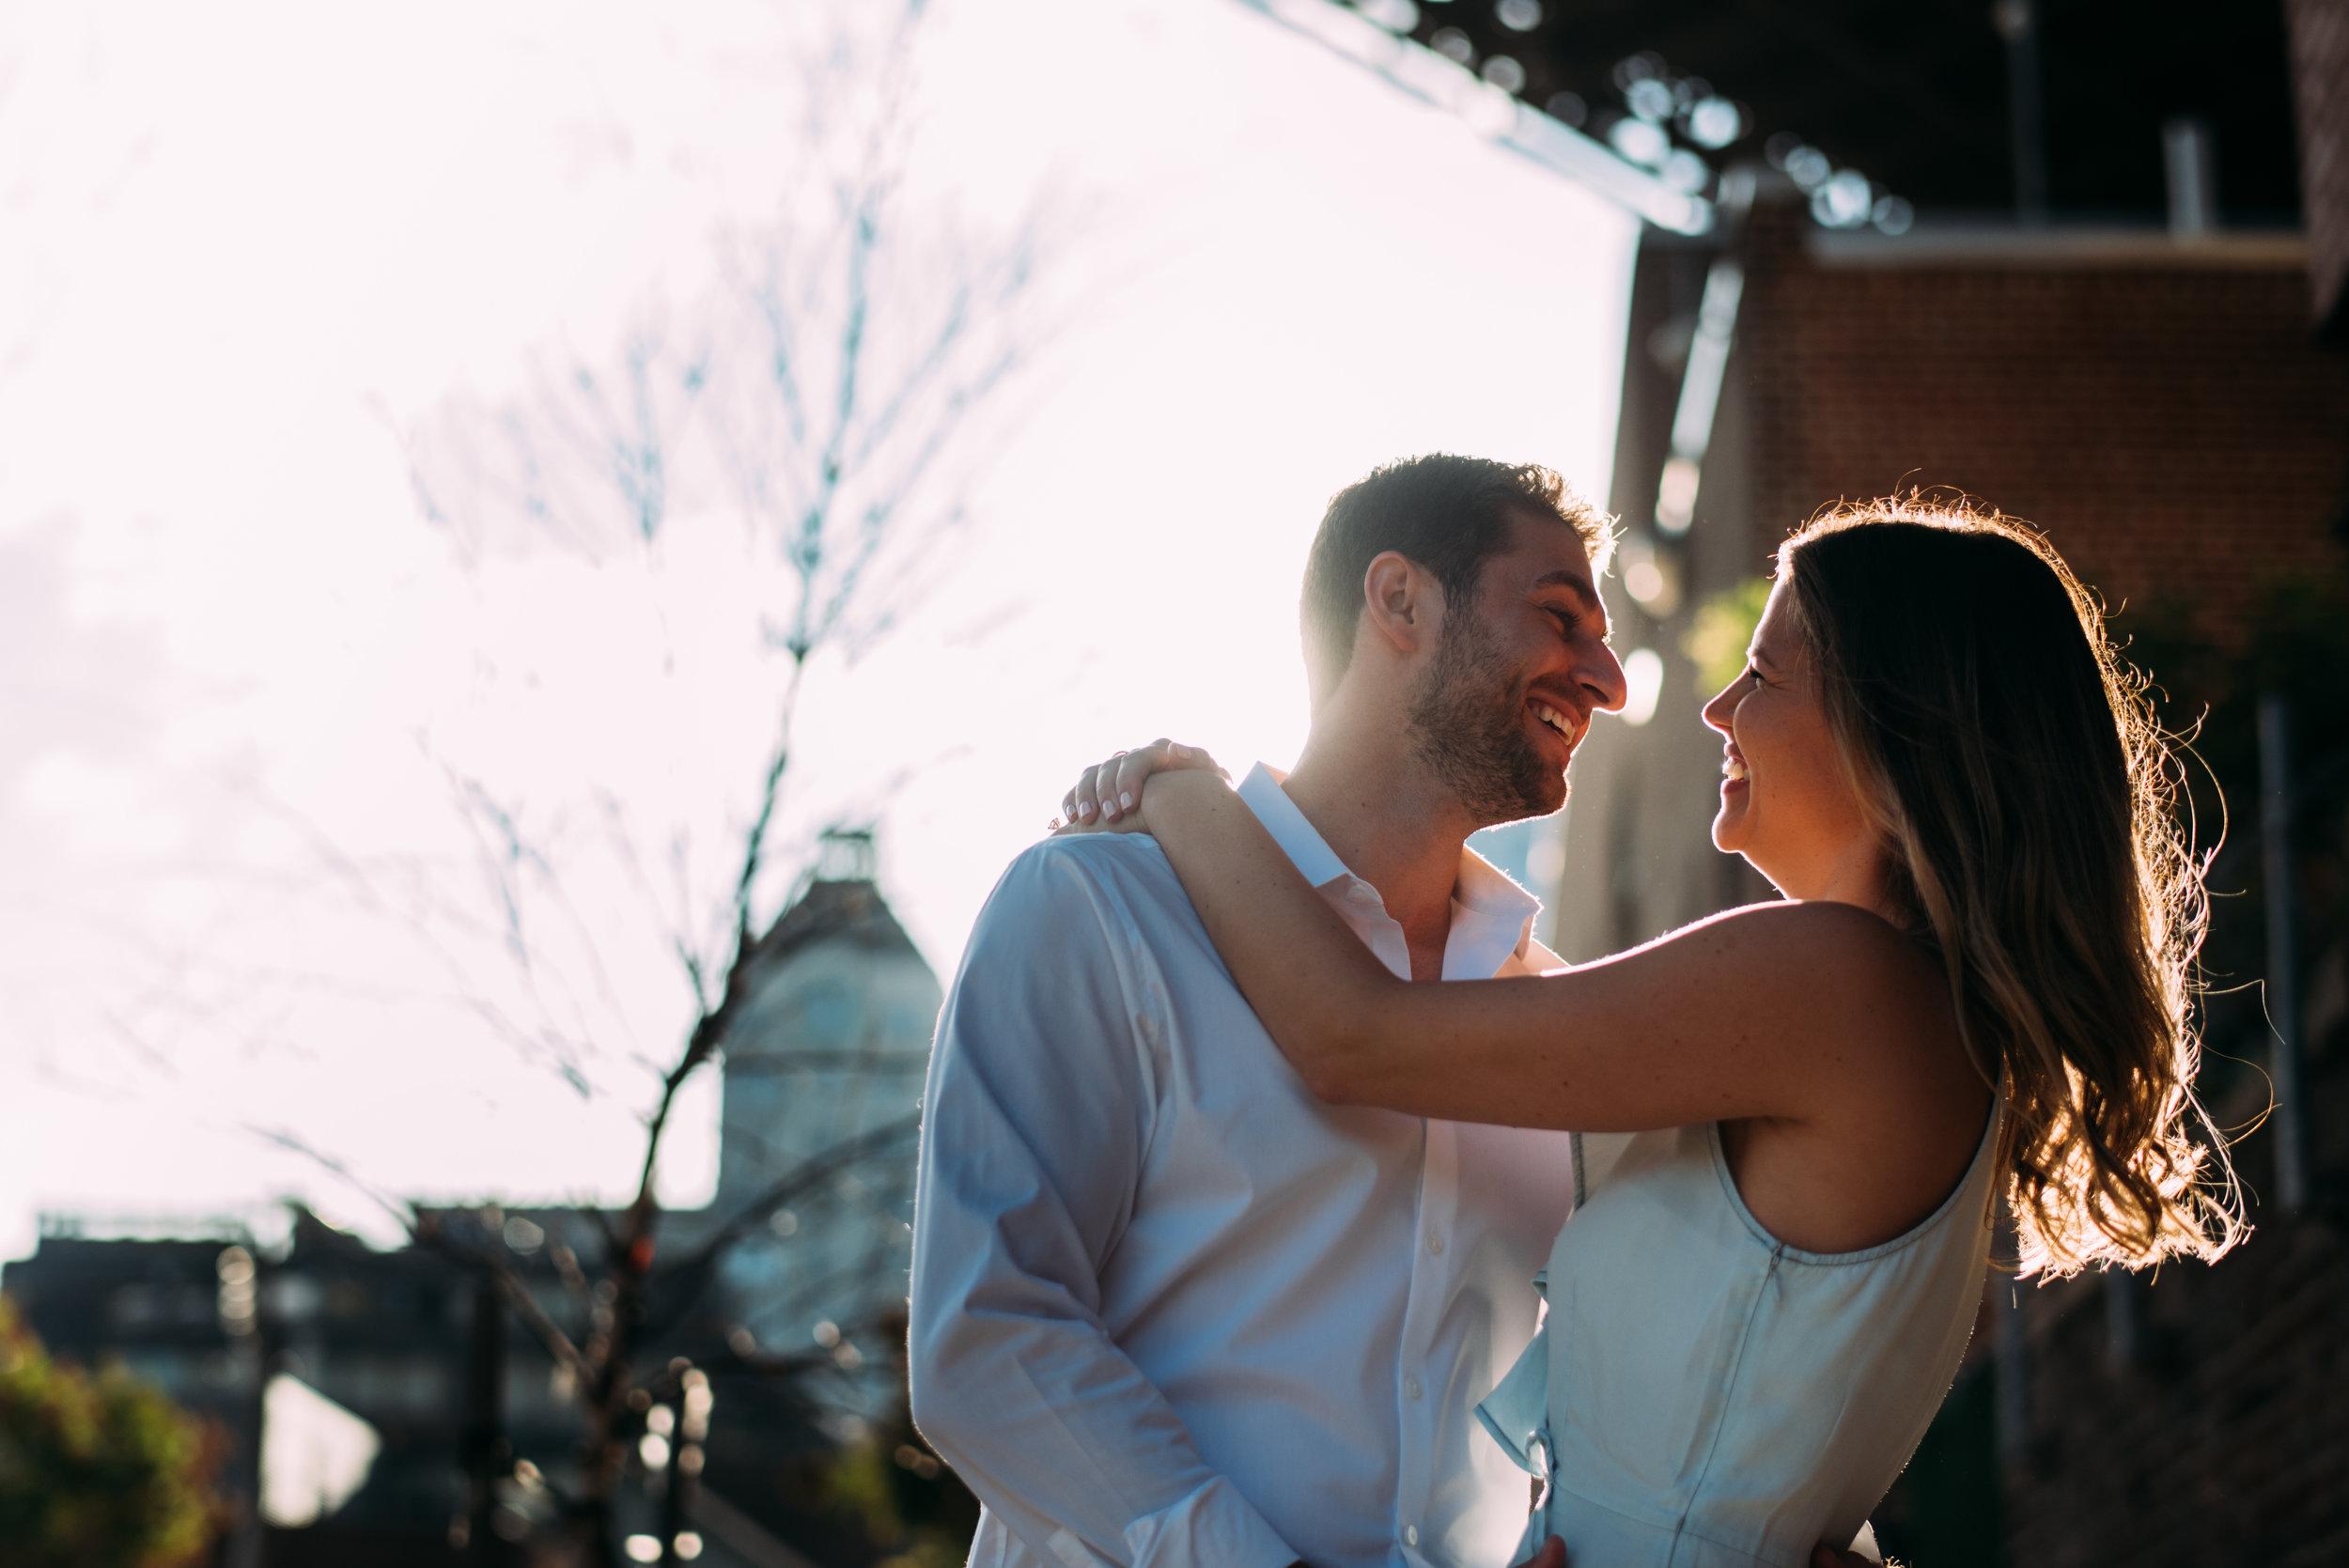 WeddingPhotos | NJPhotographer | Highlights-1-103.jpg